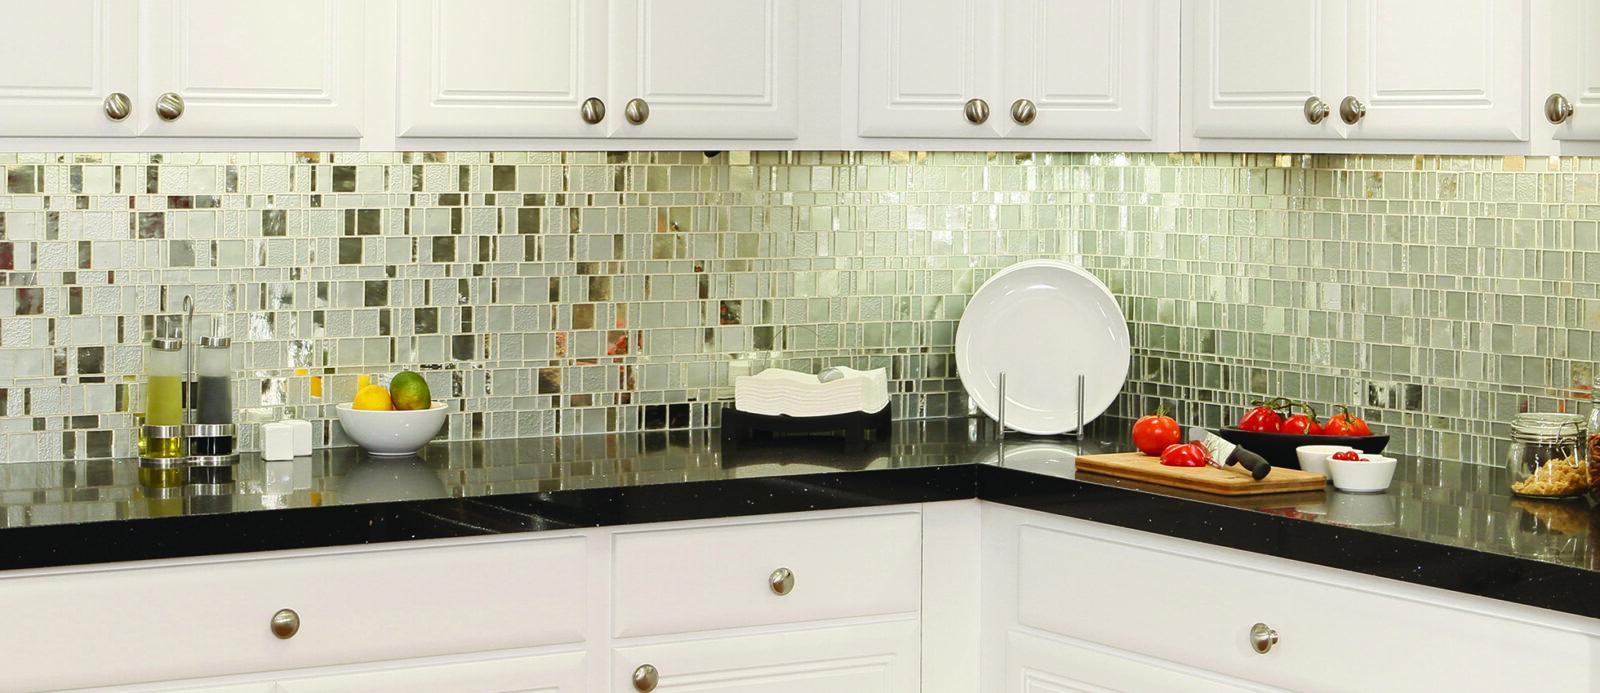 Kitchen remodel by Granite Trend Transformations